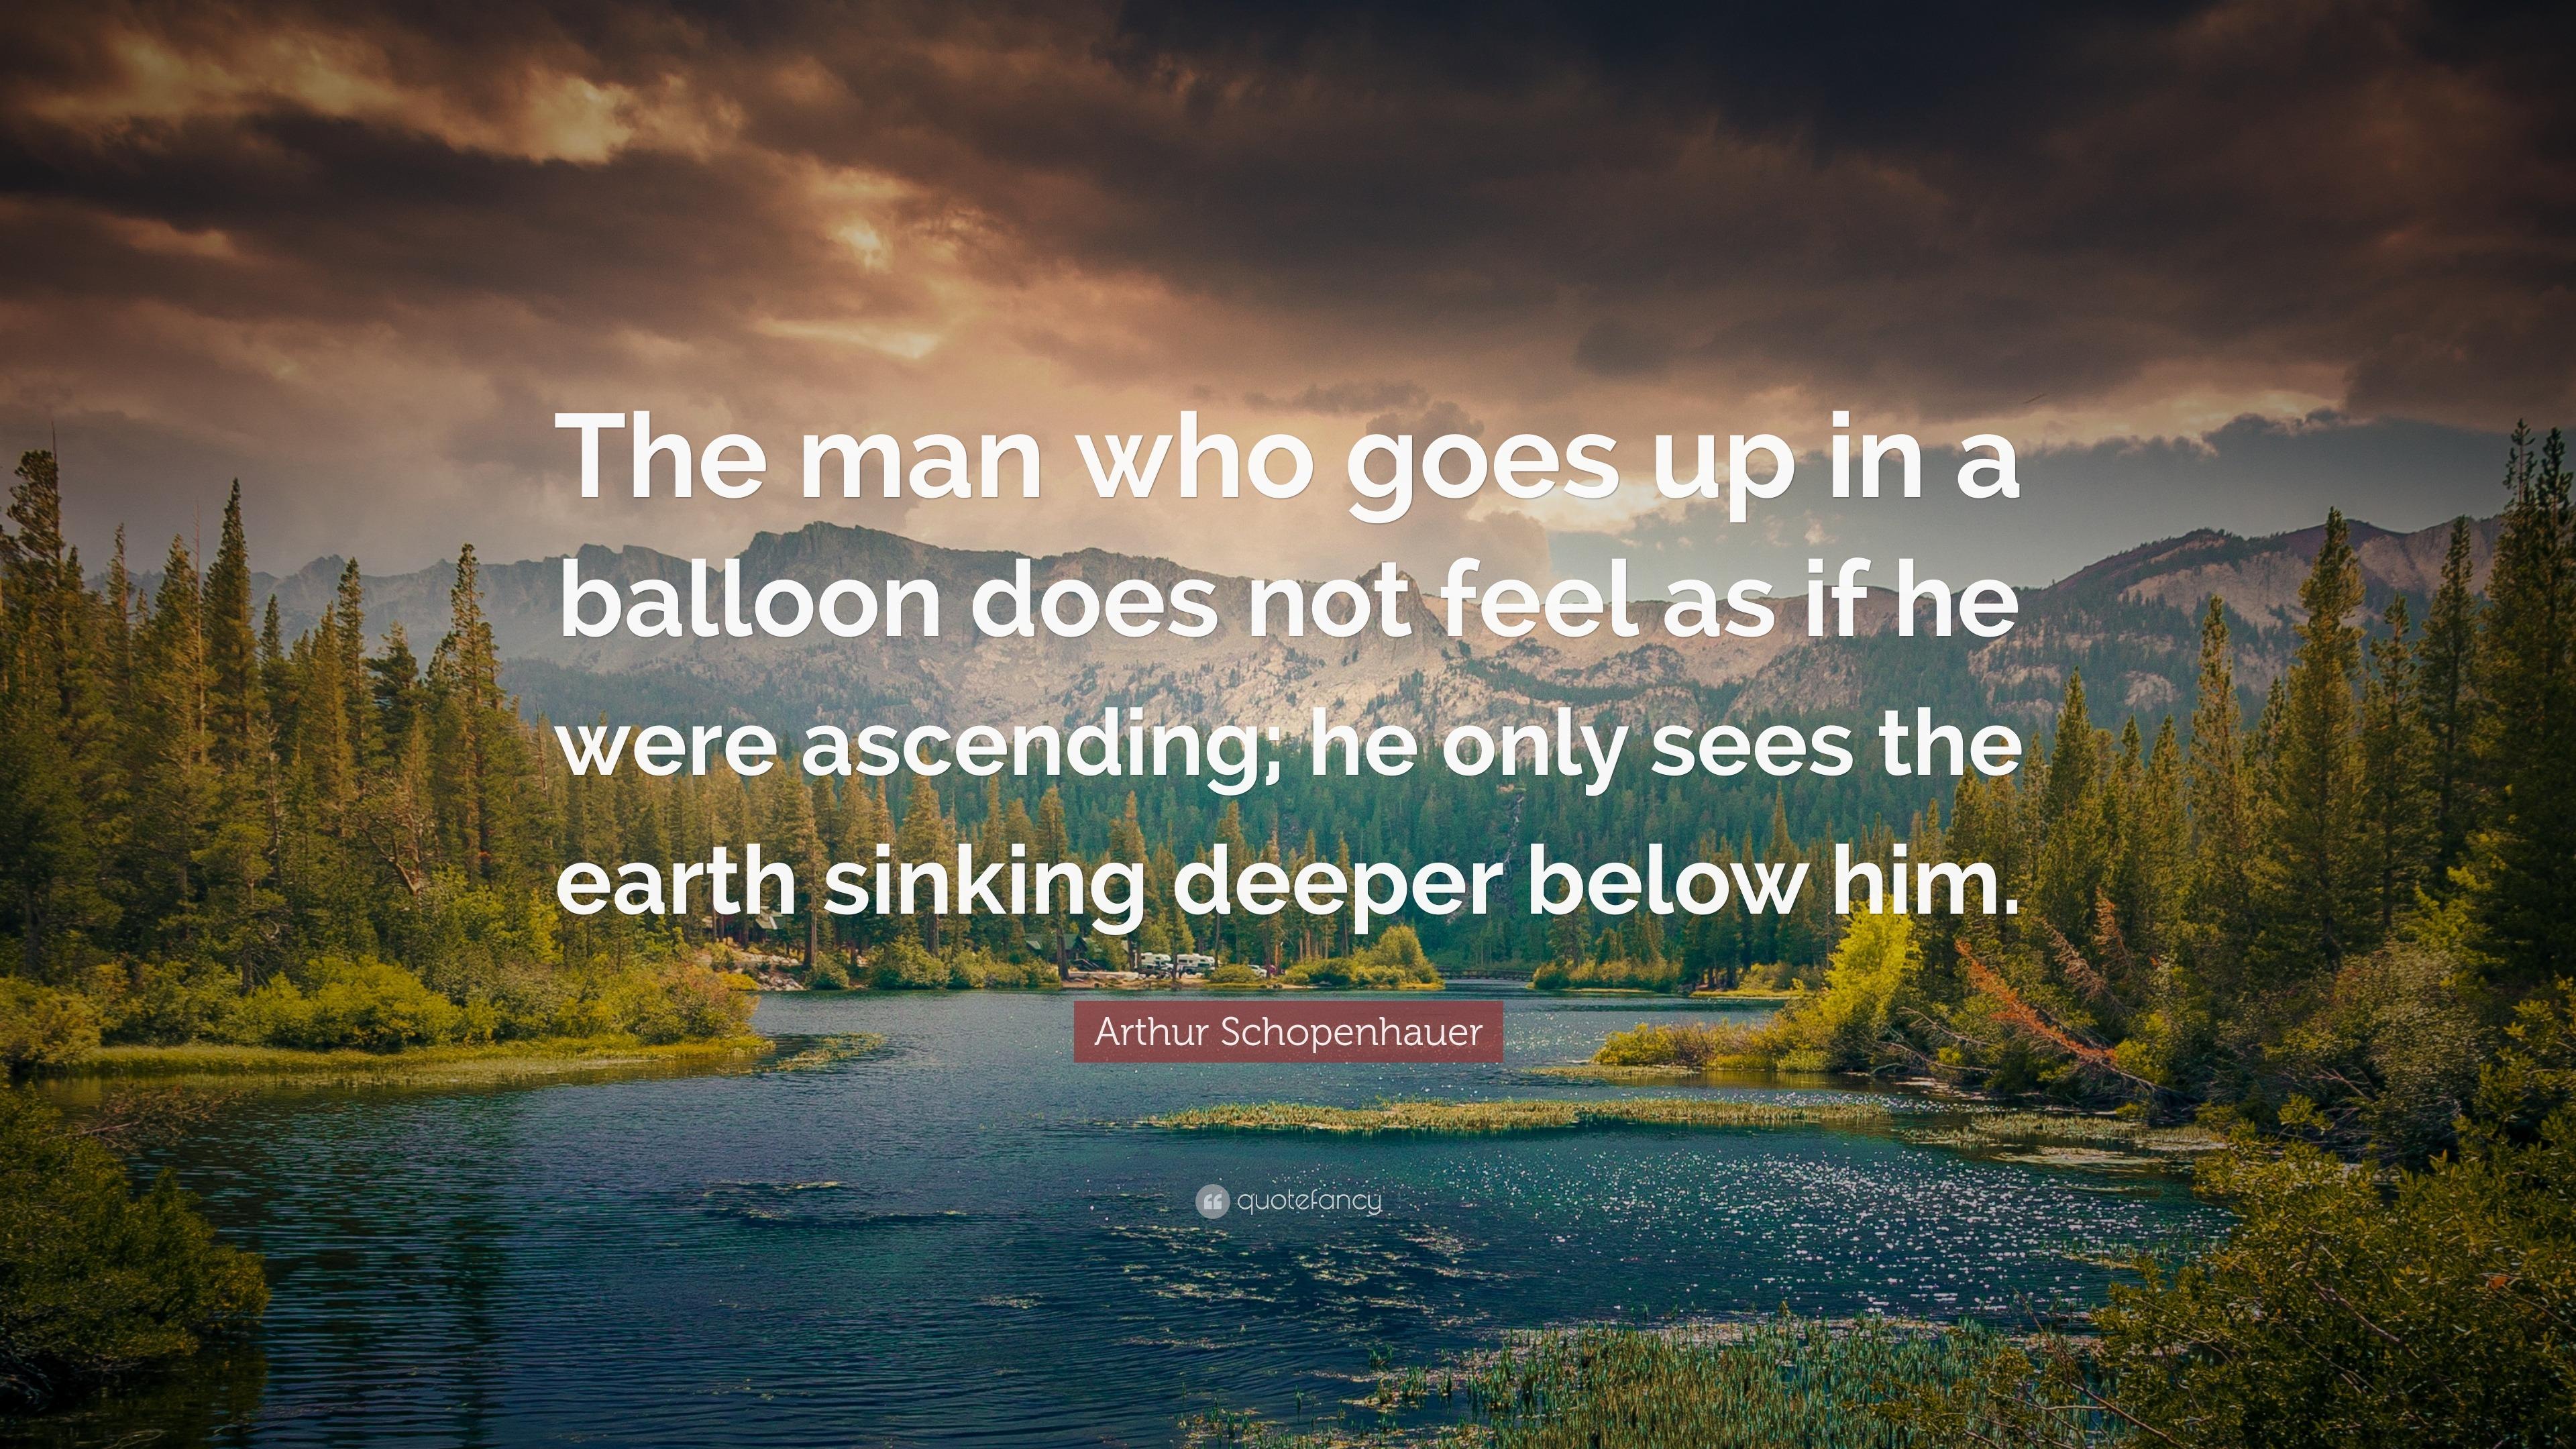 Chanakya Quotes Wallpaper Arthur Schopenhauer Quotes 100 Wallpapers Quotefancy